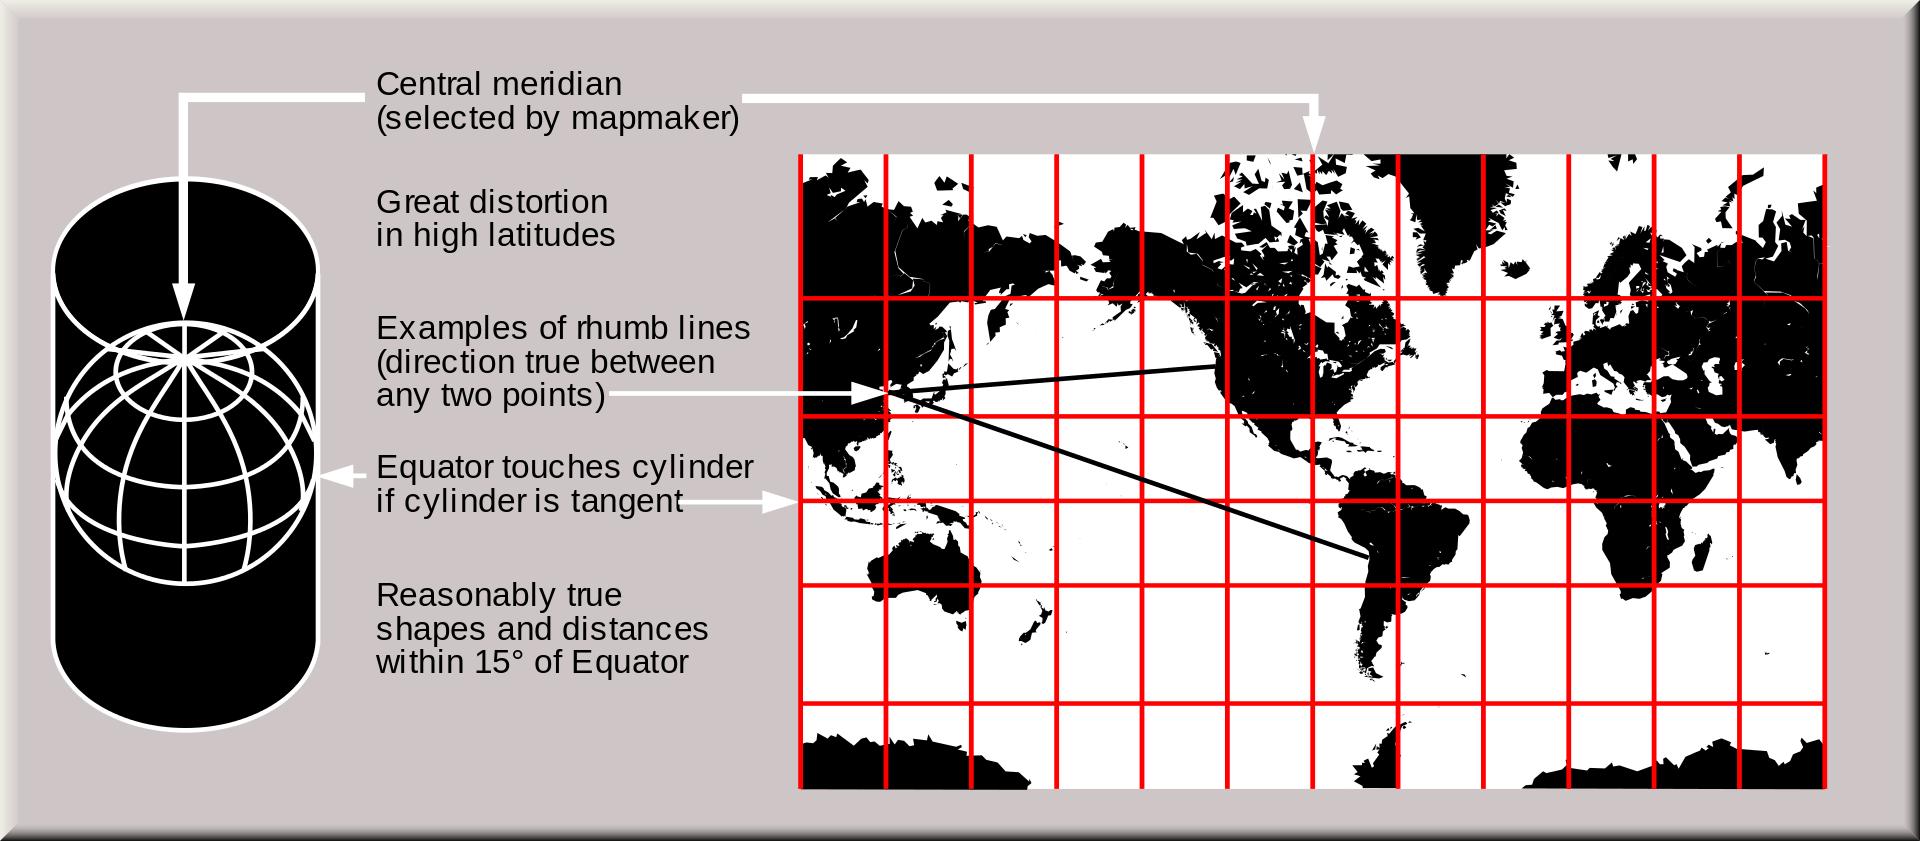 Mercator-projektion periaate visualisoituna